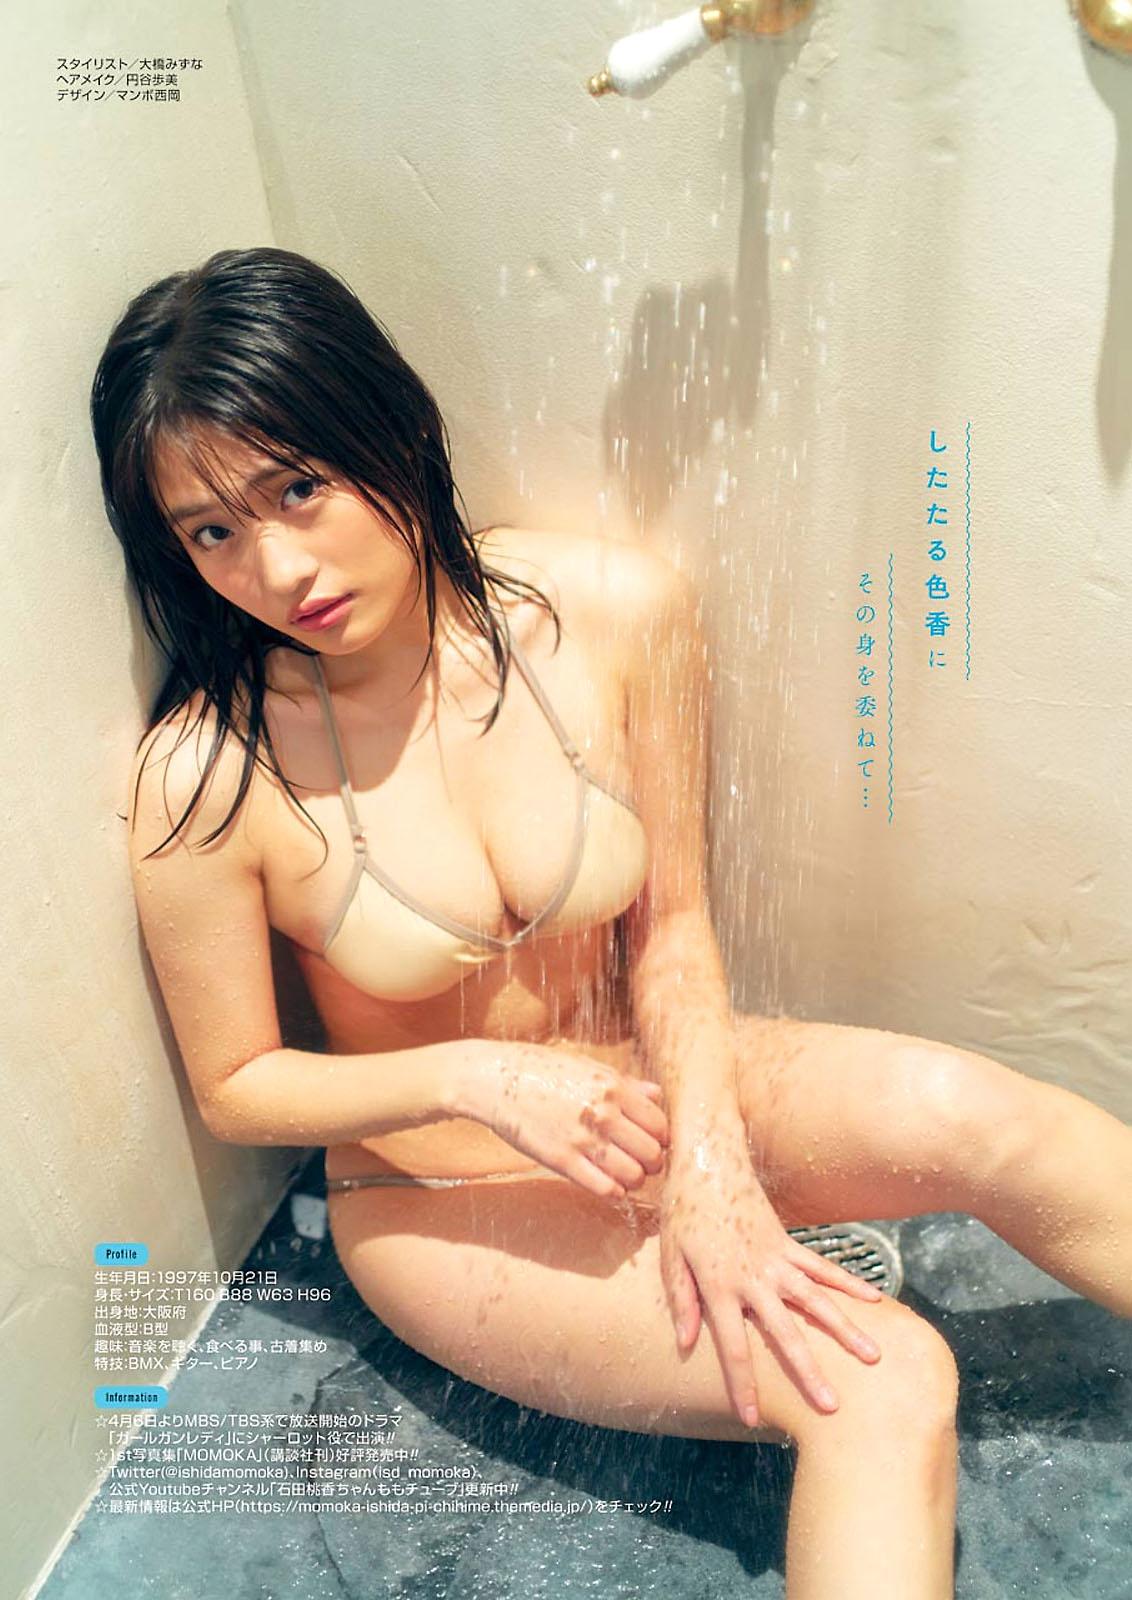 Ishida Momoka Young Gangan 210402 11.jpg